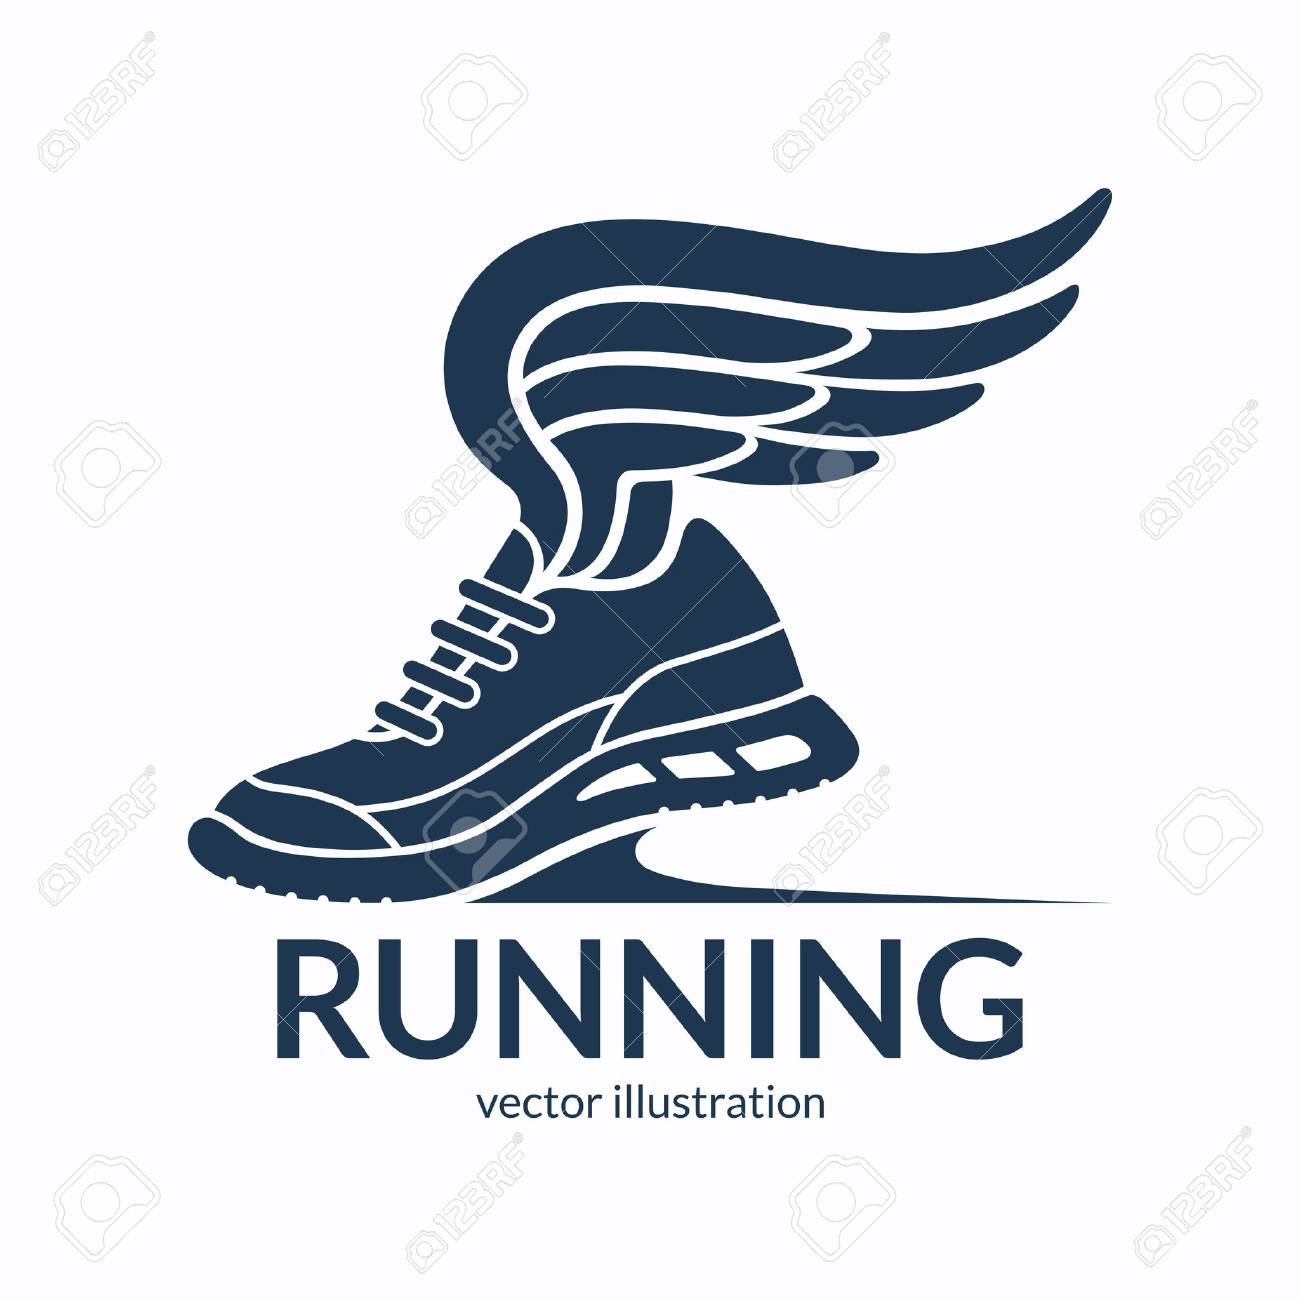 Speeding Running Shoe Symbol 2a888b1fa